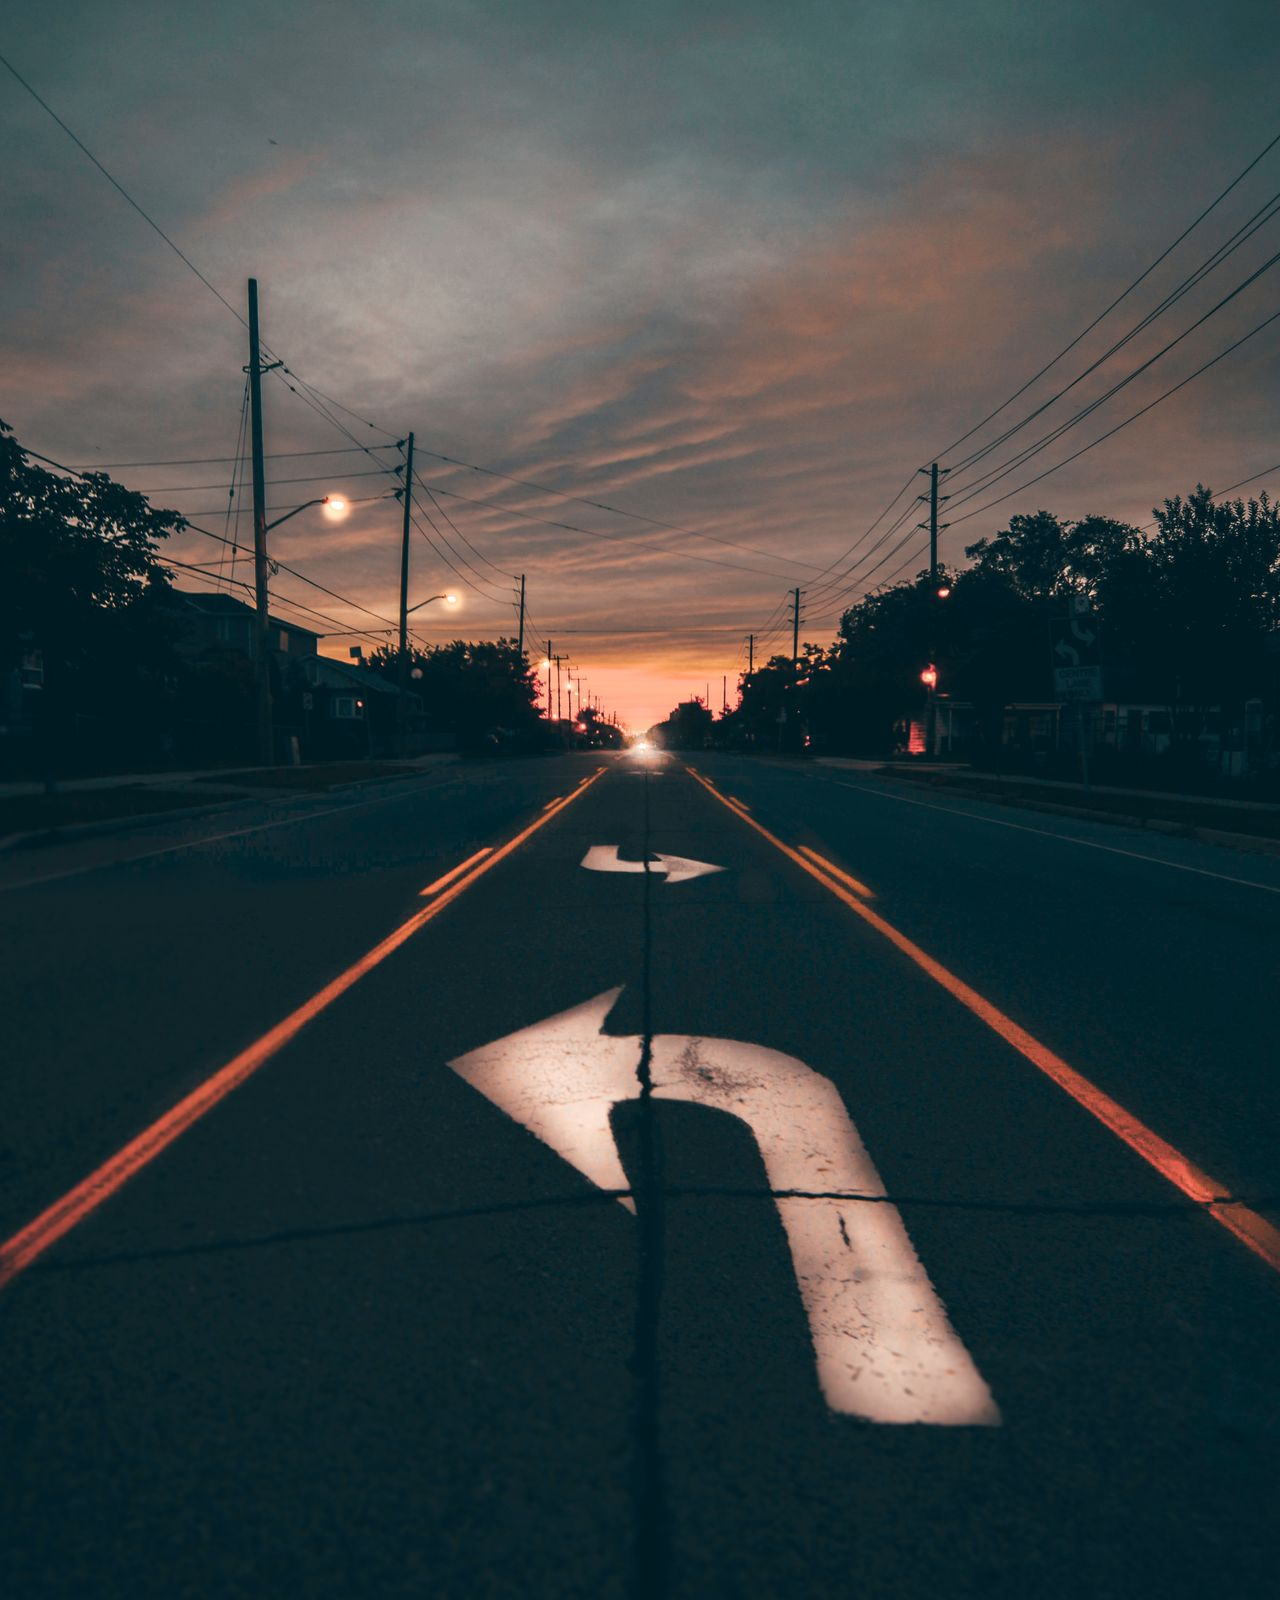 road, transportation, road marking, sunset, street